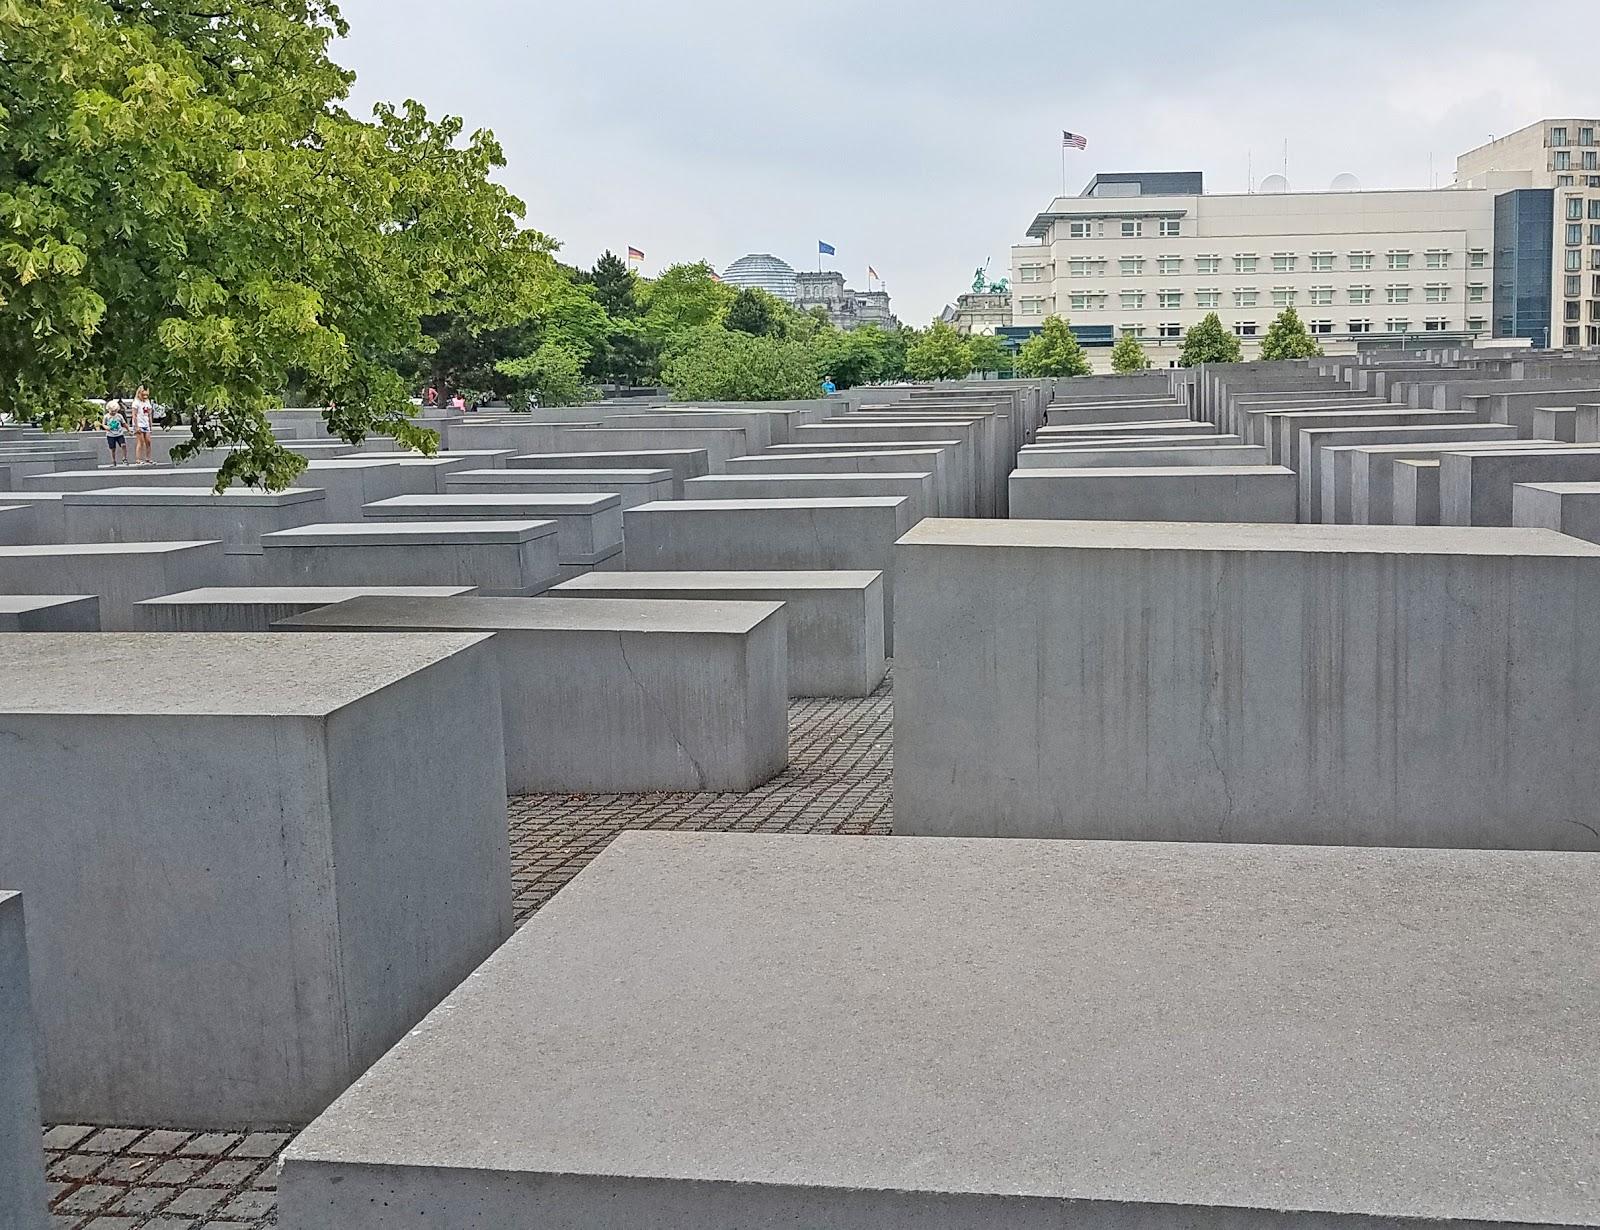 memorial to the murdered jews of europe denkmal fuer die ermordeten juden europas or holocaust memorial 2003 2004 by